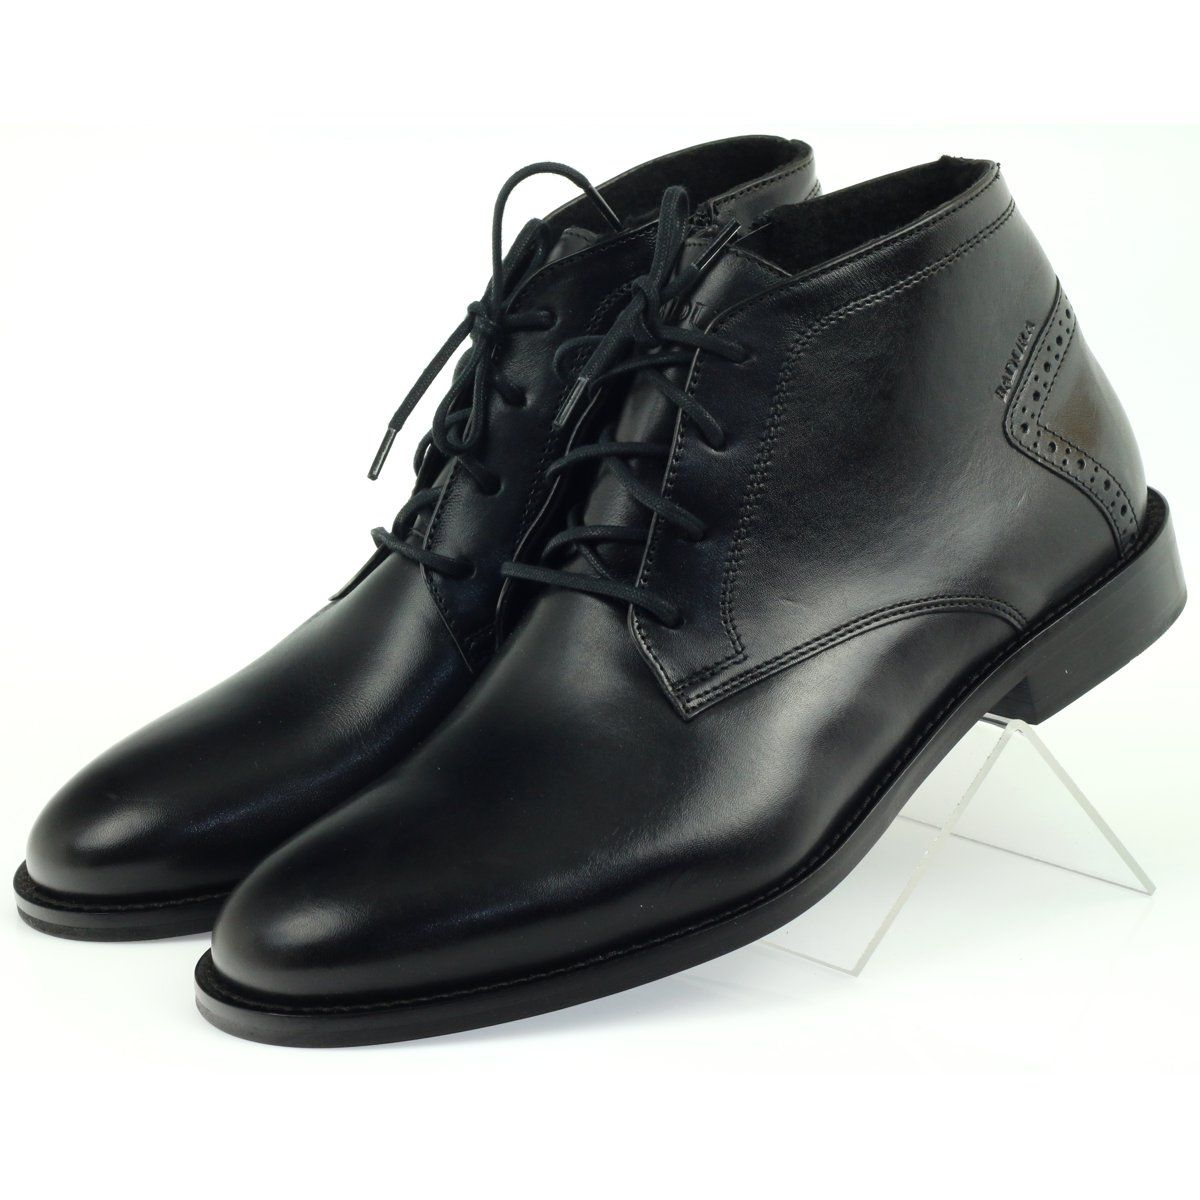 Botki Trzewiki Zimowe Badura 4663 Czarne Mens Winter Shoes Boots Winter Boots